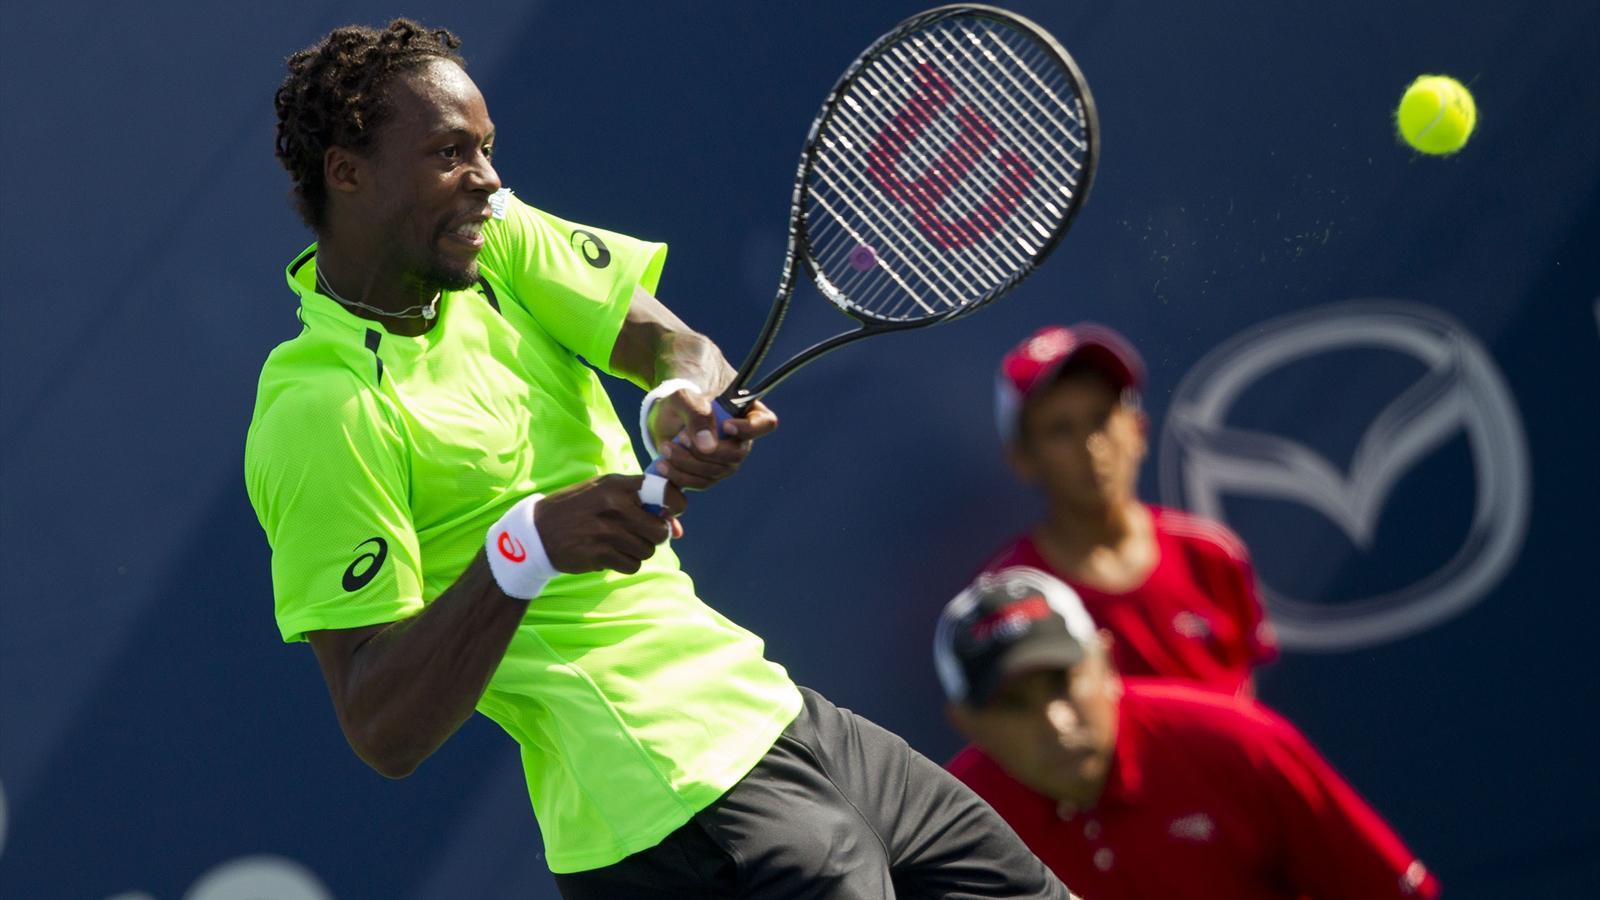 Masters 1000 de Toronto 2014 : Monfils s